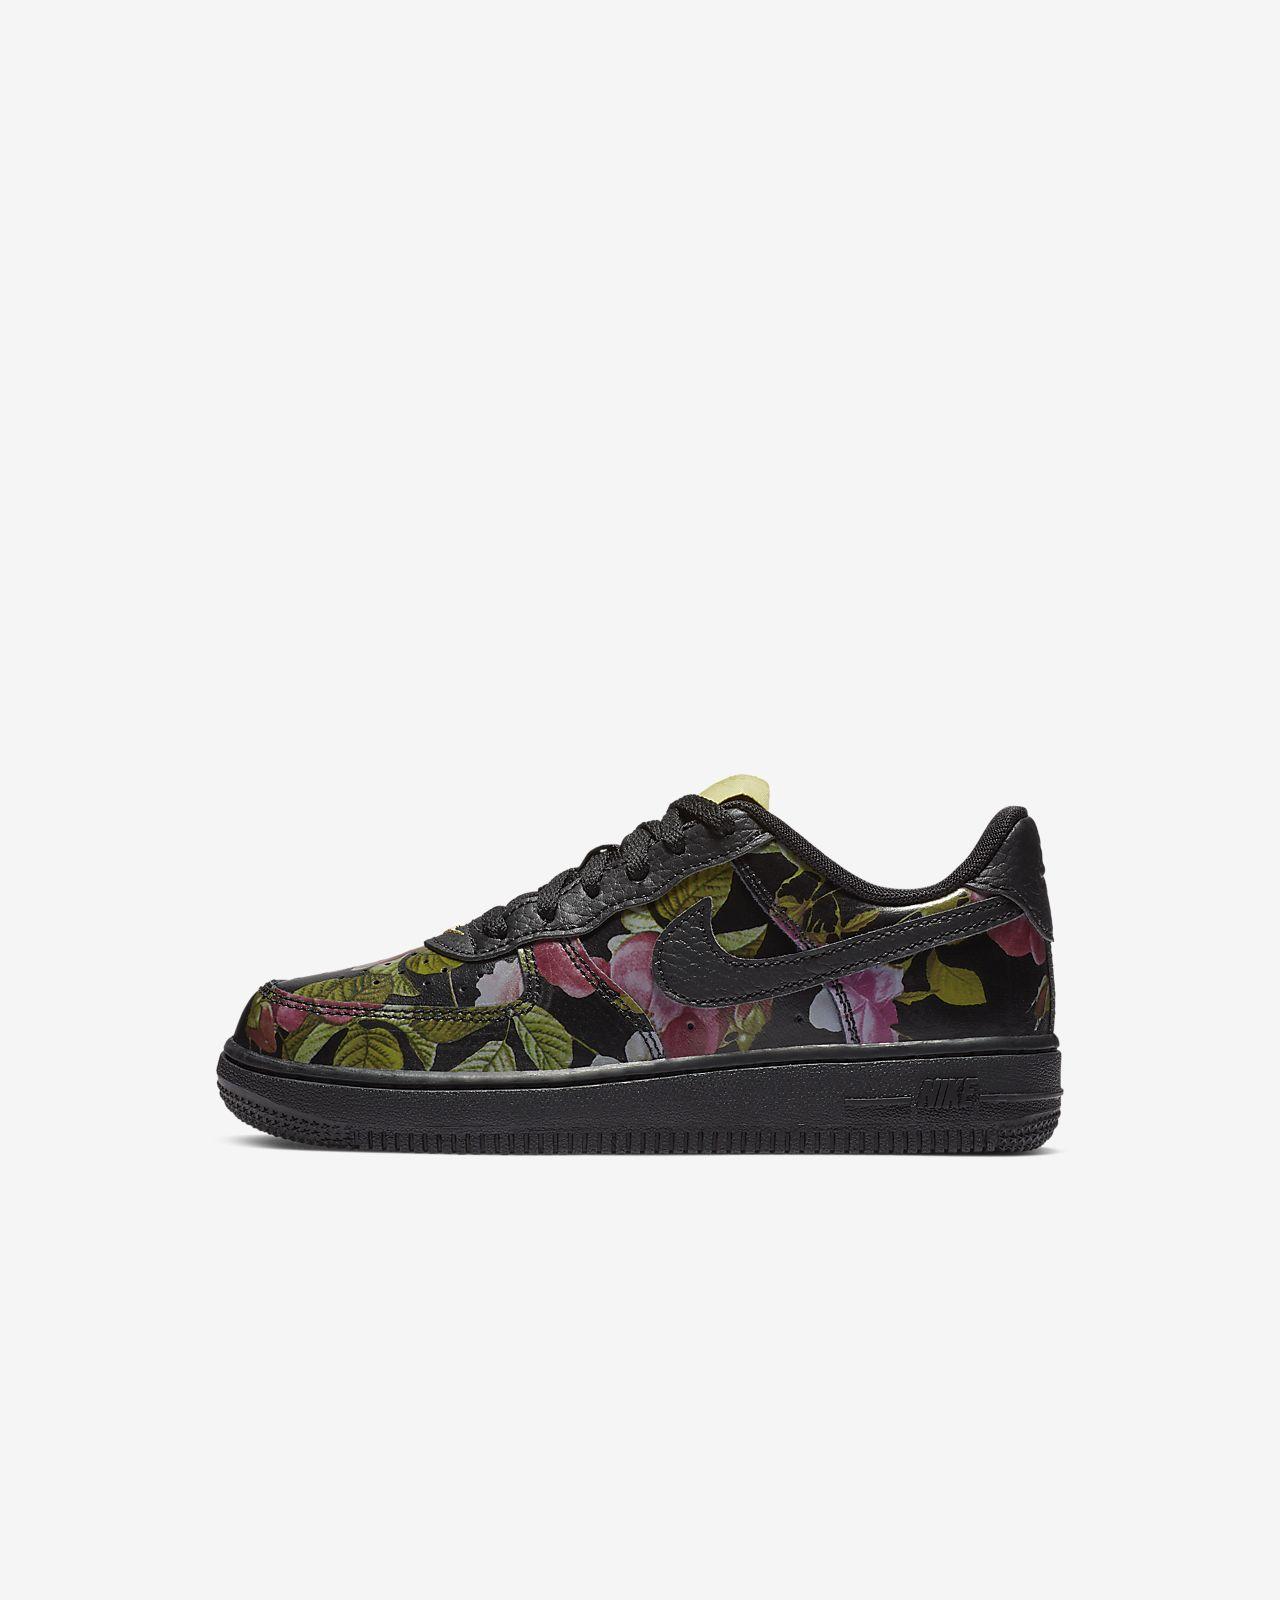 Nike Force 1 LXX Zapatillas florales - Niño/a pequeño/a